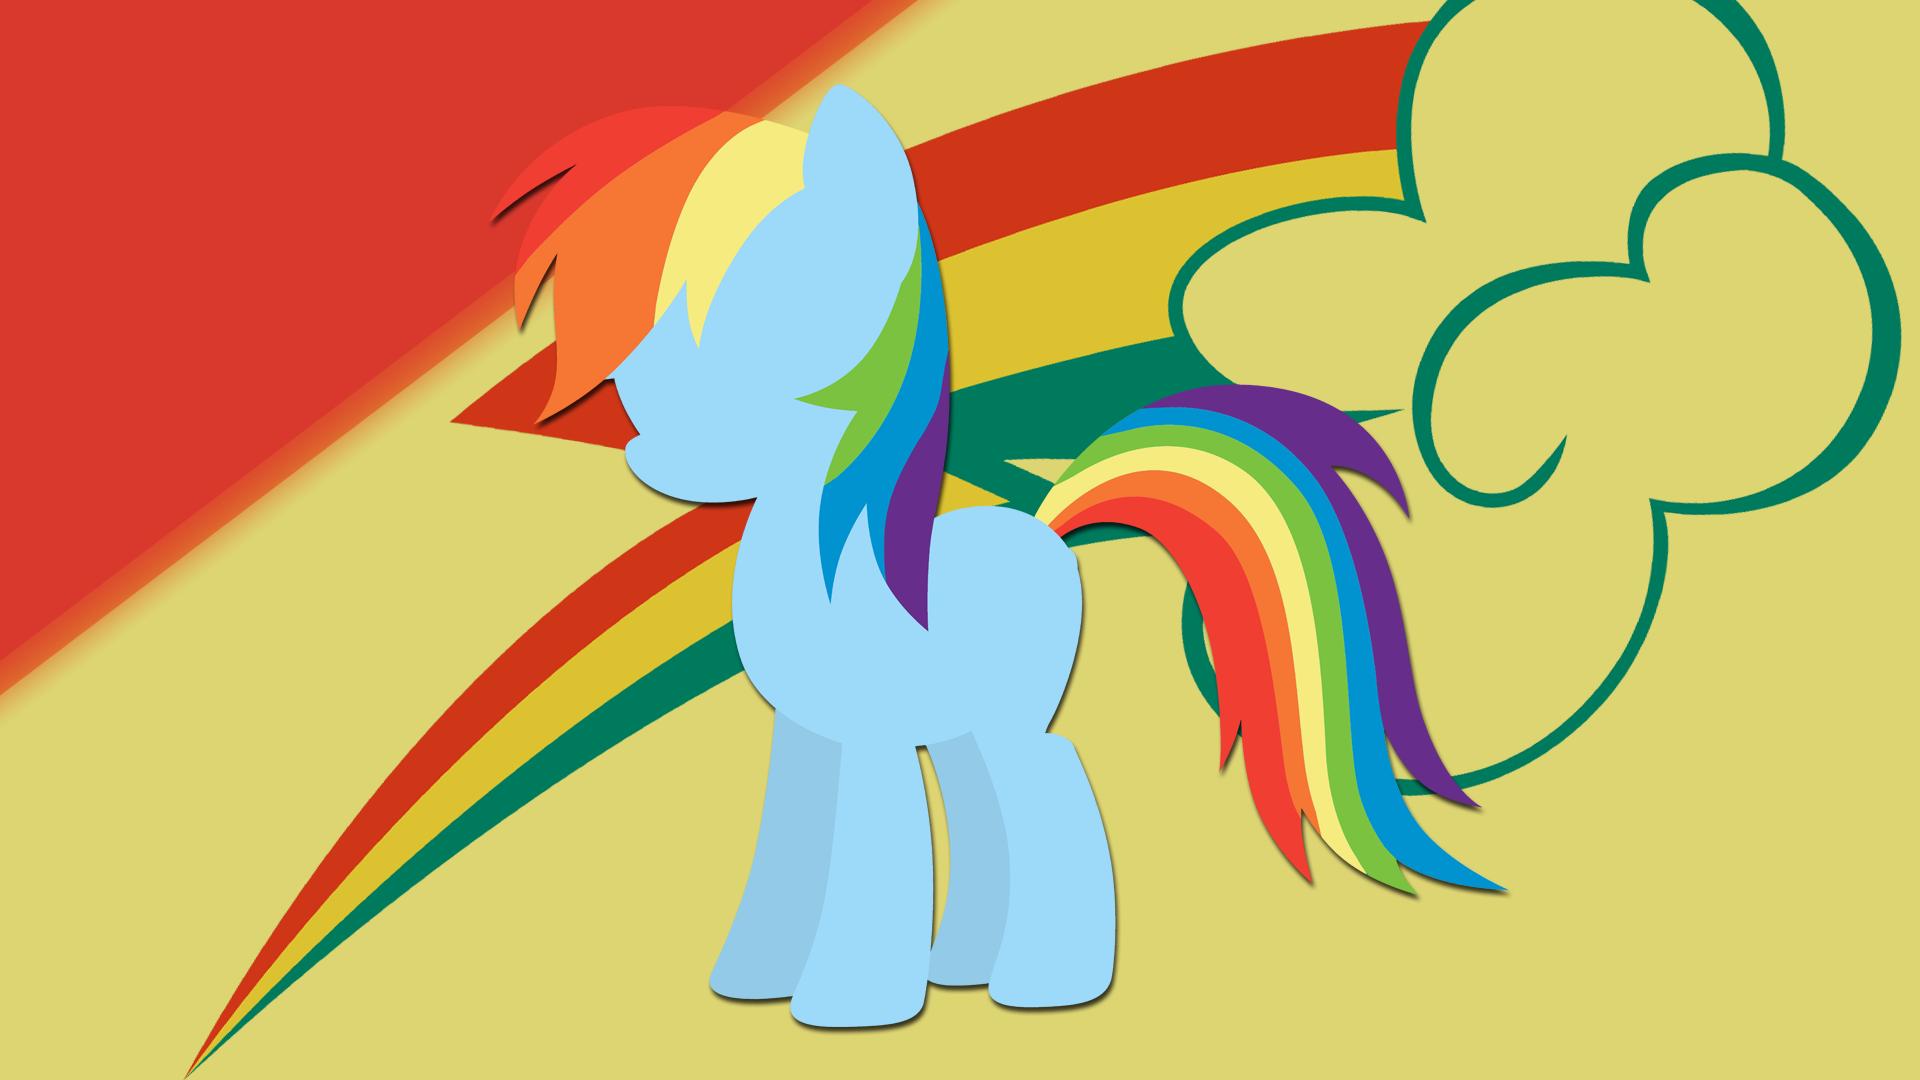 Rainbow Dash Silhouette Wallpaper By Rdbrony16 On Deviantart